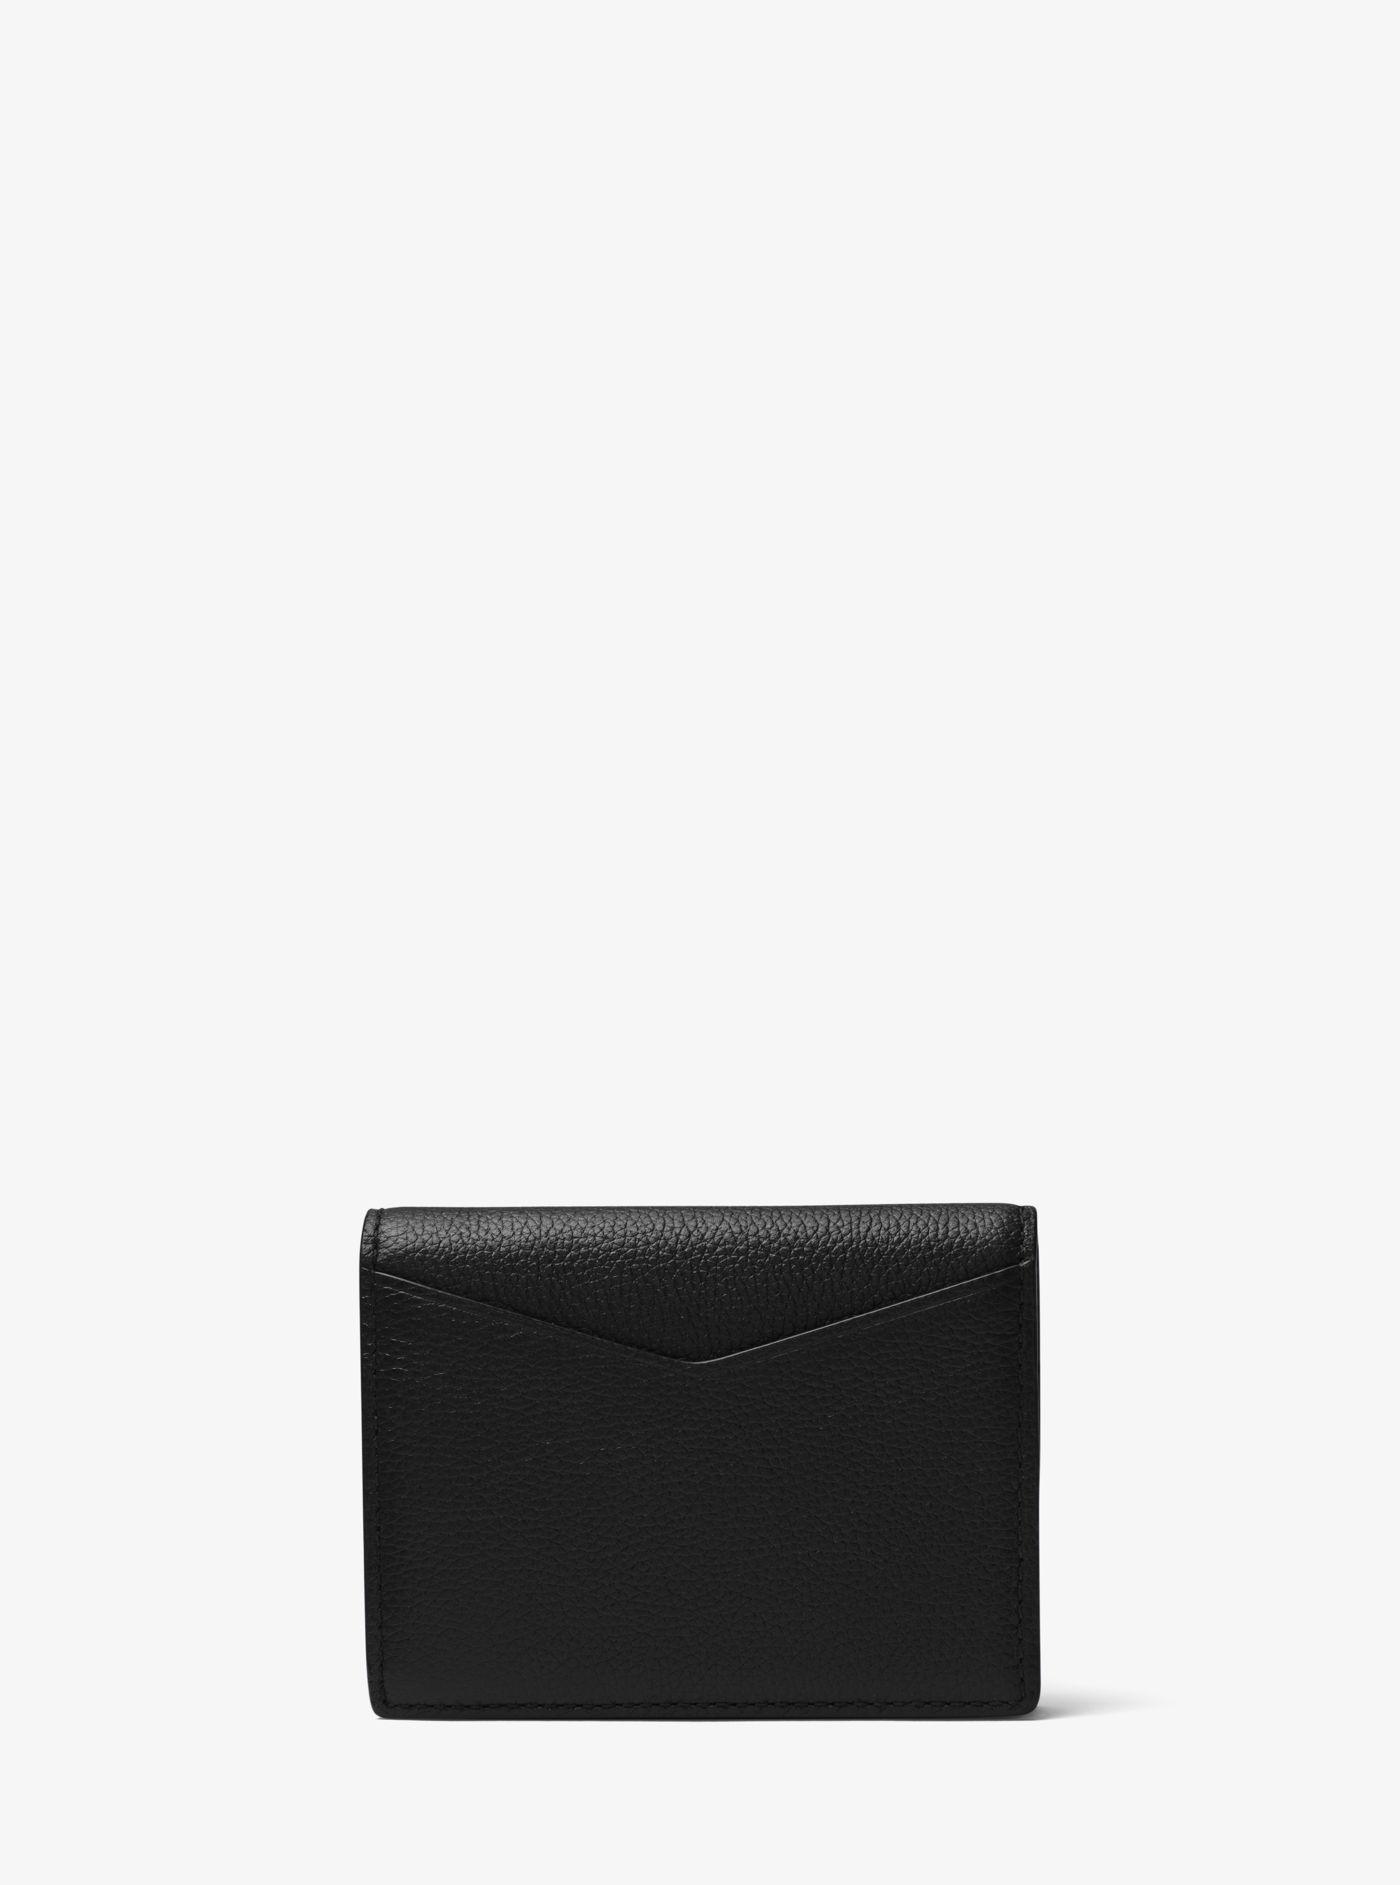 d65f30cf15a2 Lyst - Michael Kors Bryant Leather L-fold Wallet in Black for Men